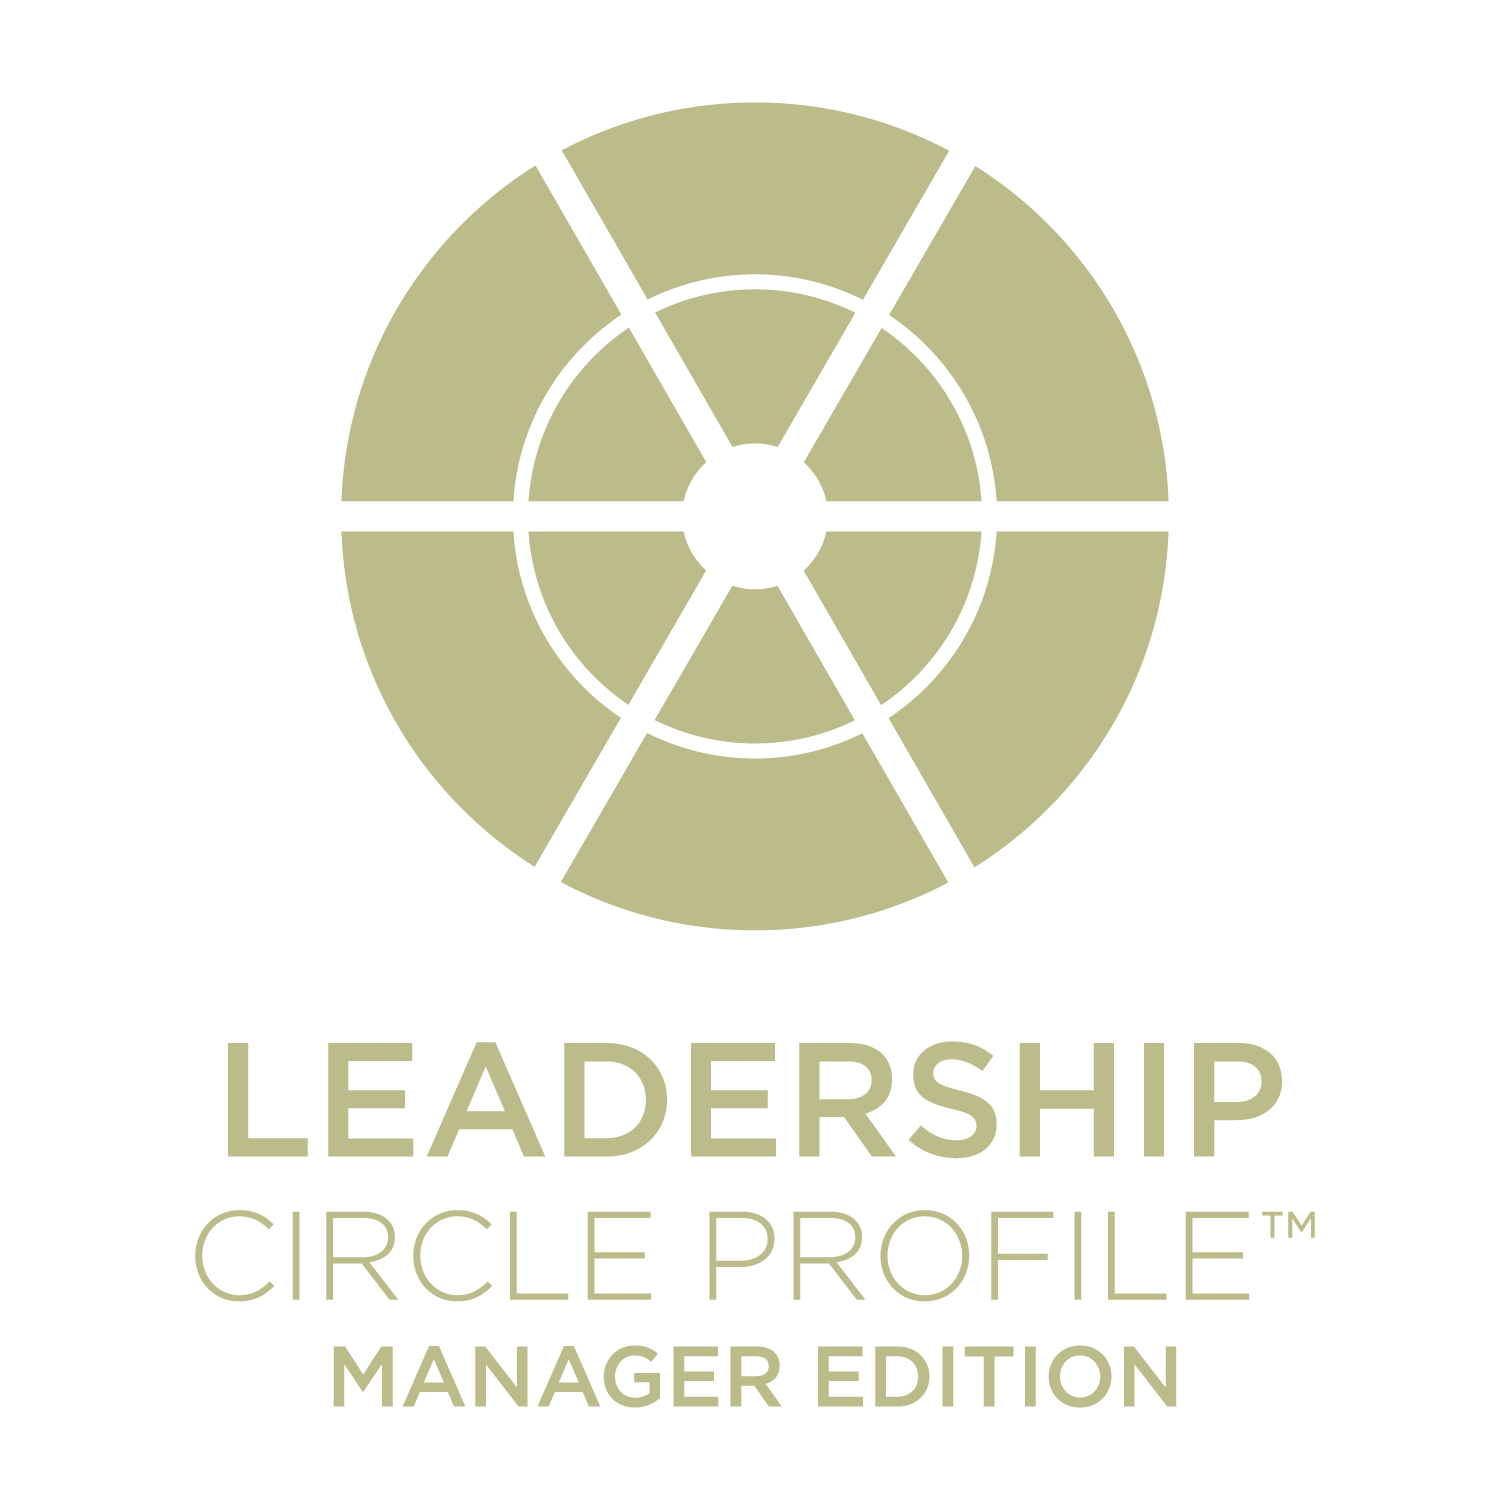 Leadershp-Circle-Profile-Logo-ME-square-01